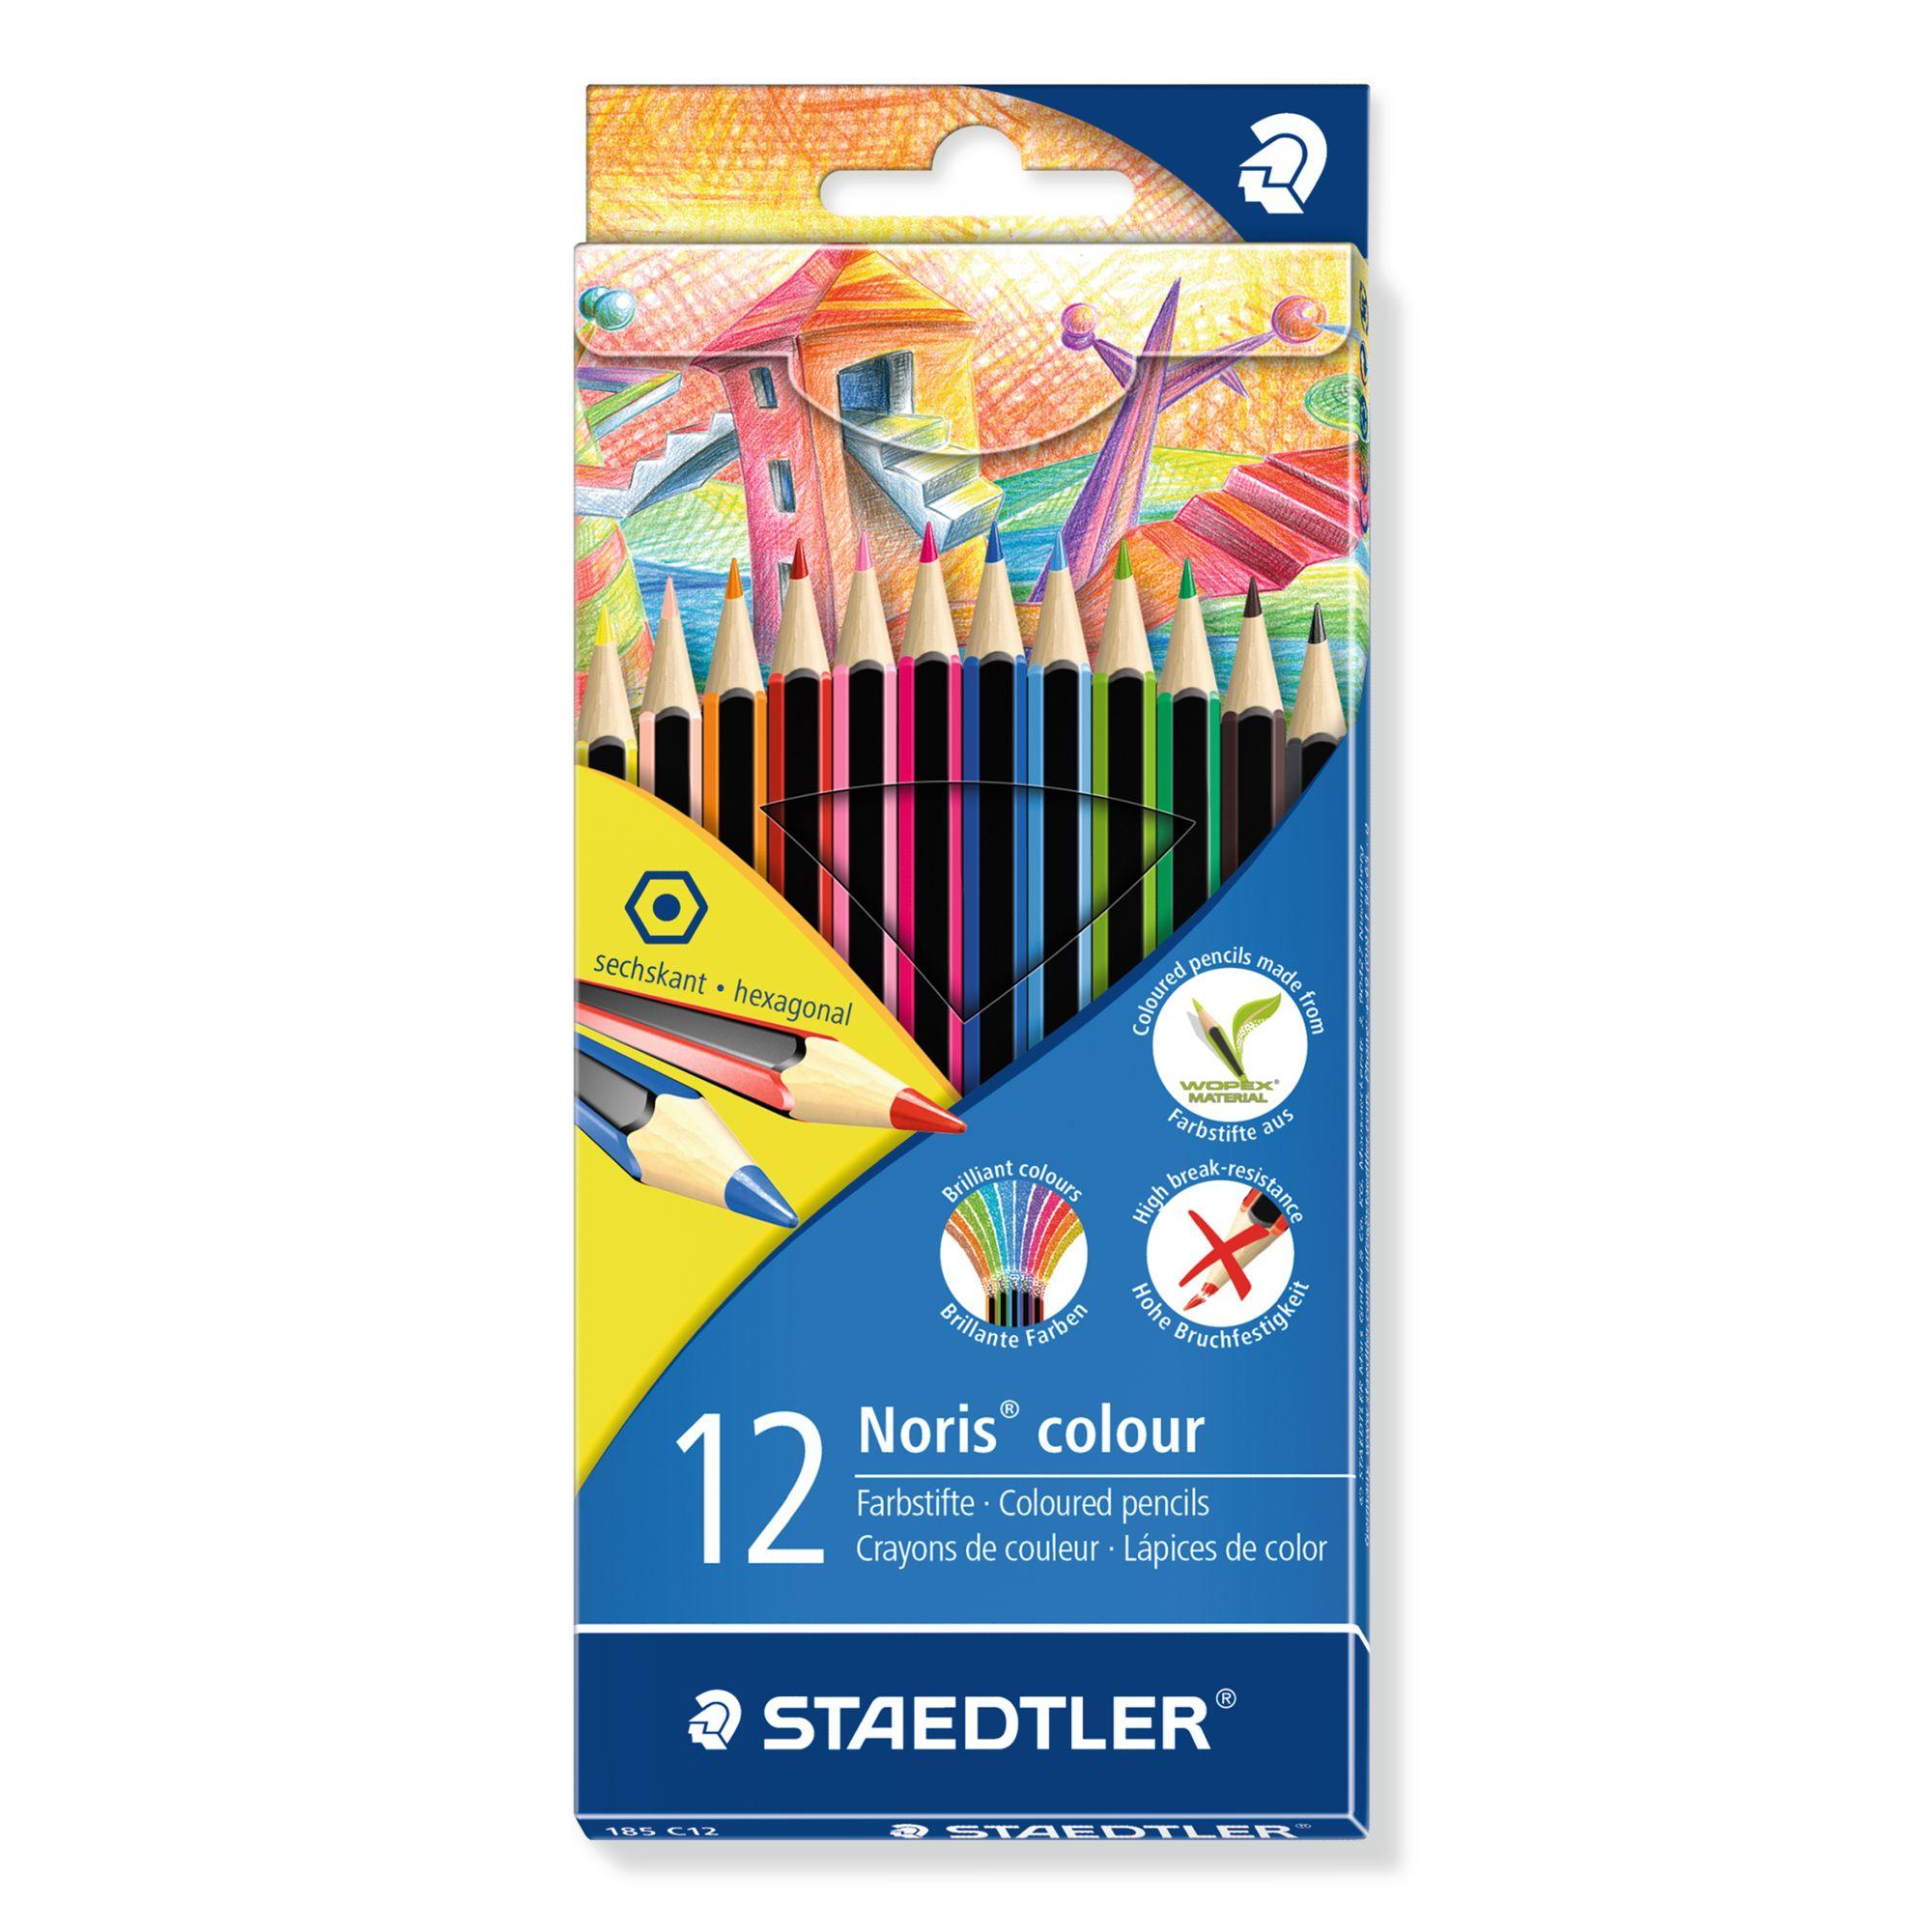 Staedtler STAEDTLER Noris Colouring Pencils, Pack of 12, Multi